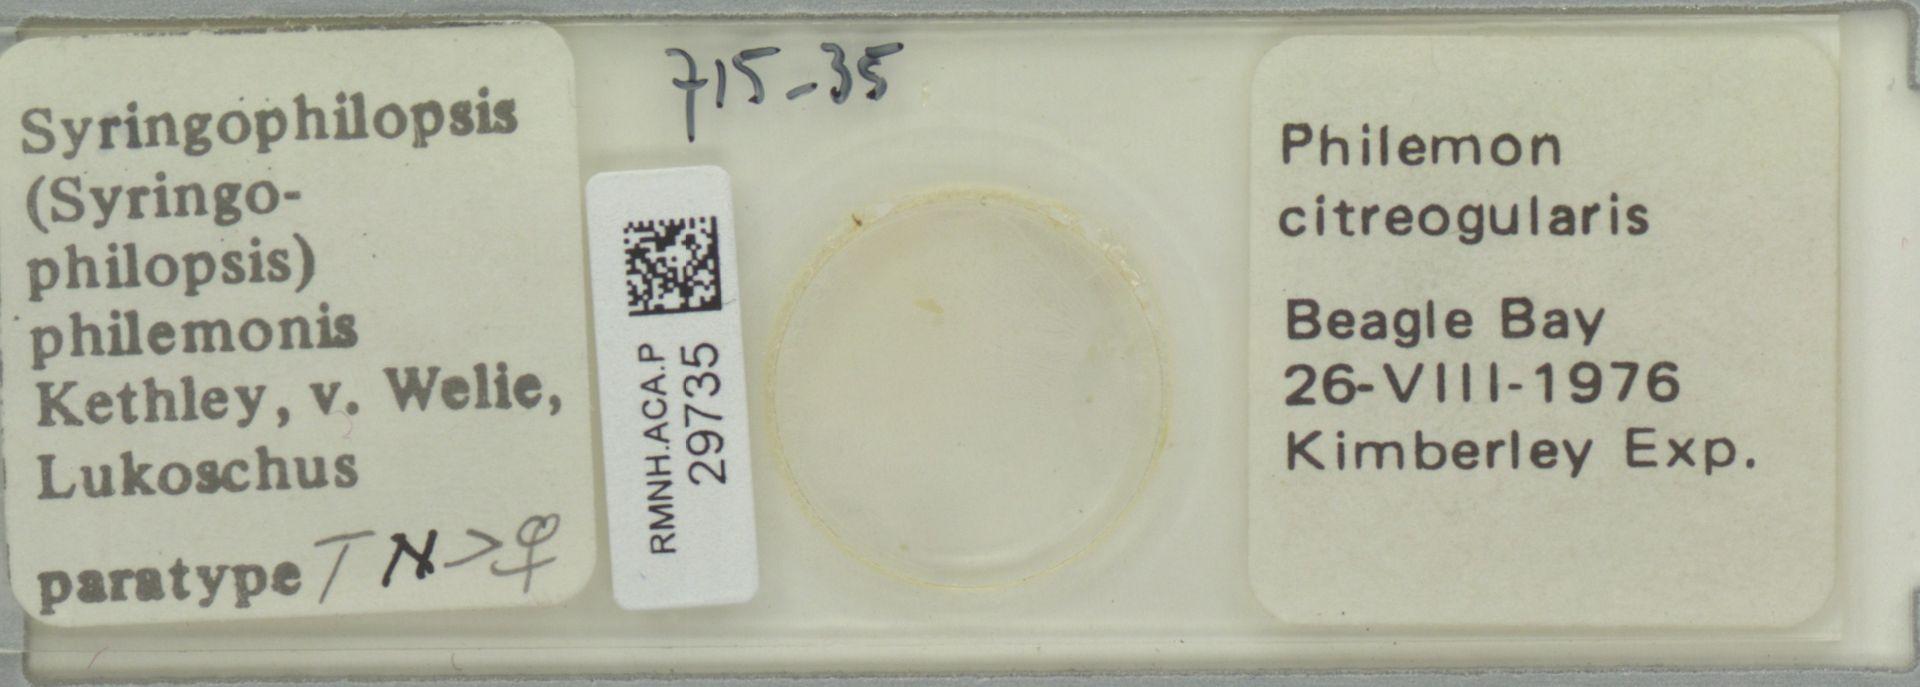 RMNH.ACA.P.29735 | Syringophilopsis (Syringophilopsis) philemonis Kethley, v. Welie, Lukoschus